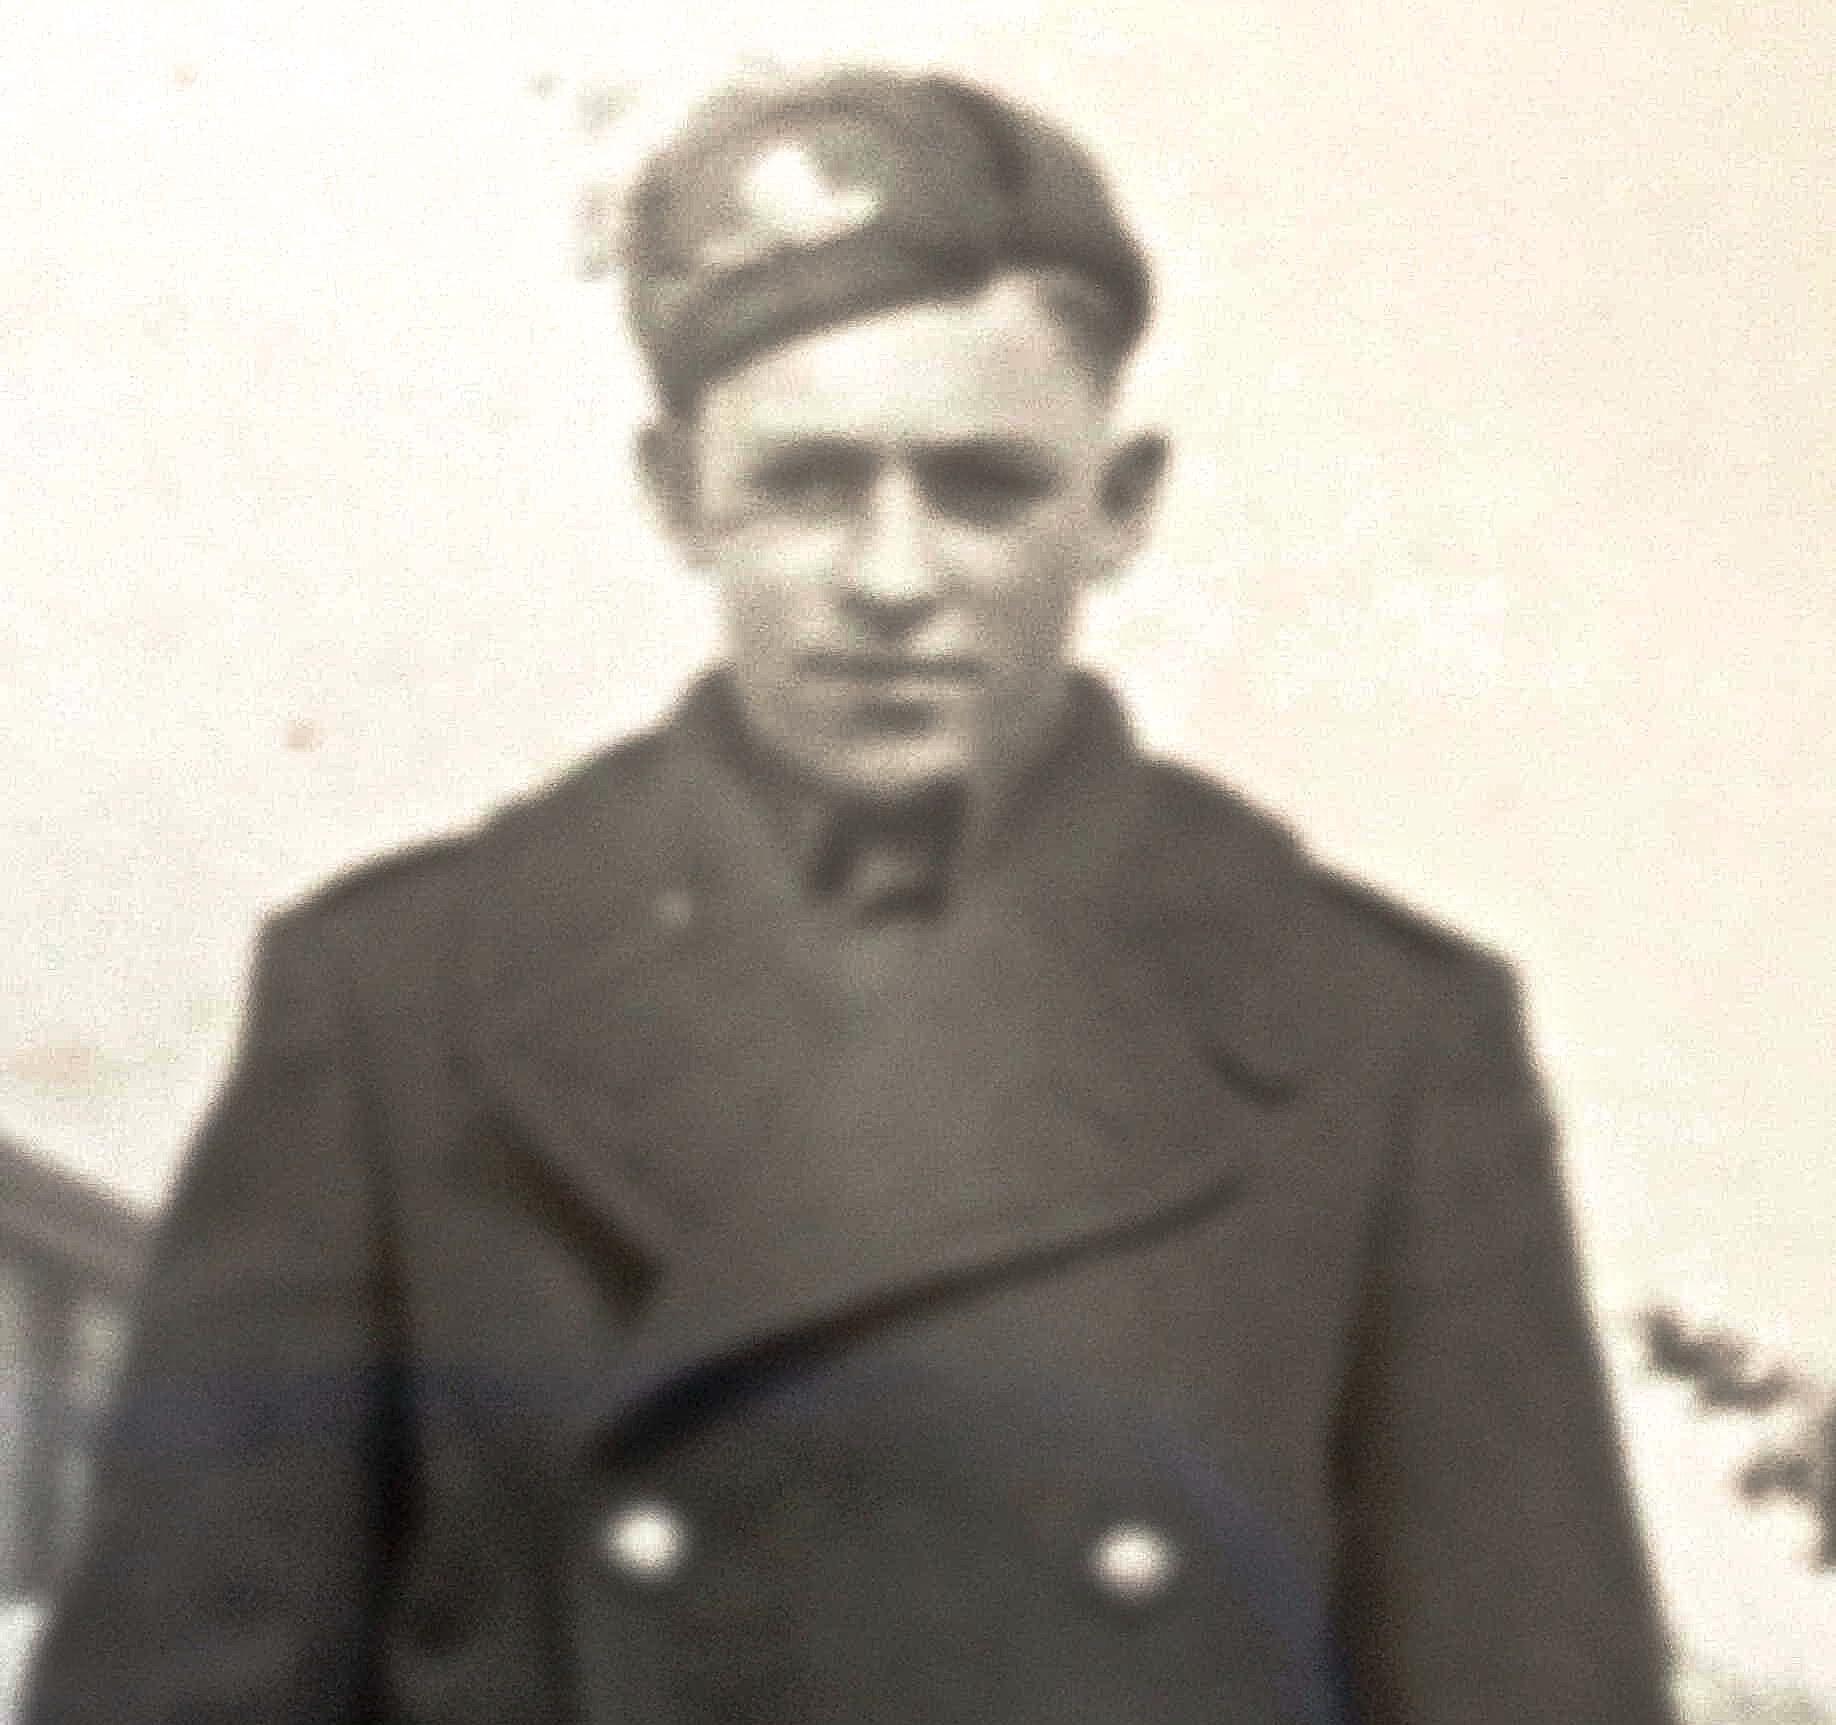 Photo of THOMAS ALBERT MCLEOD